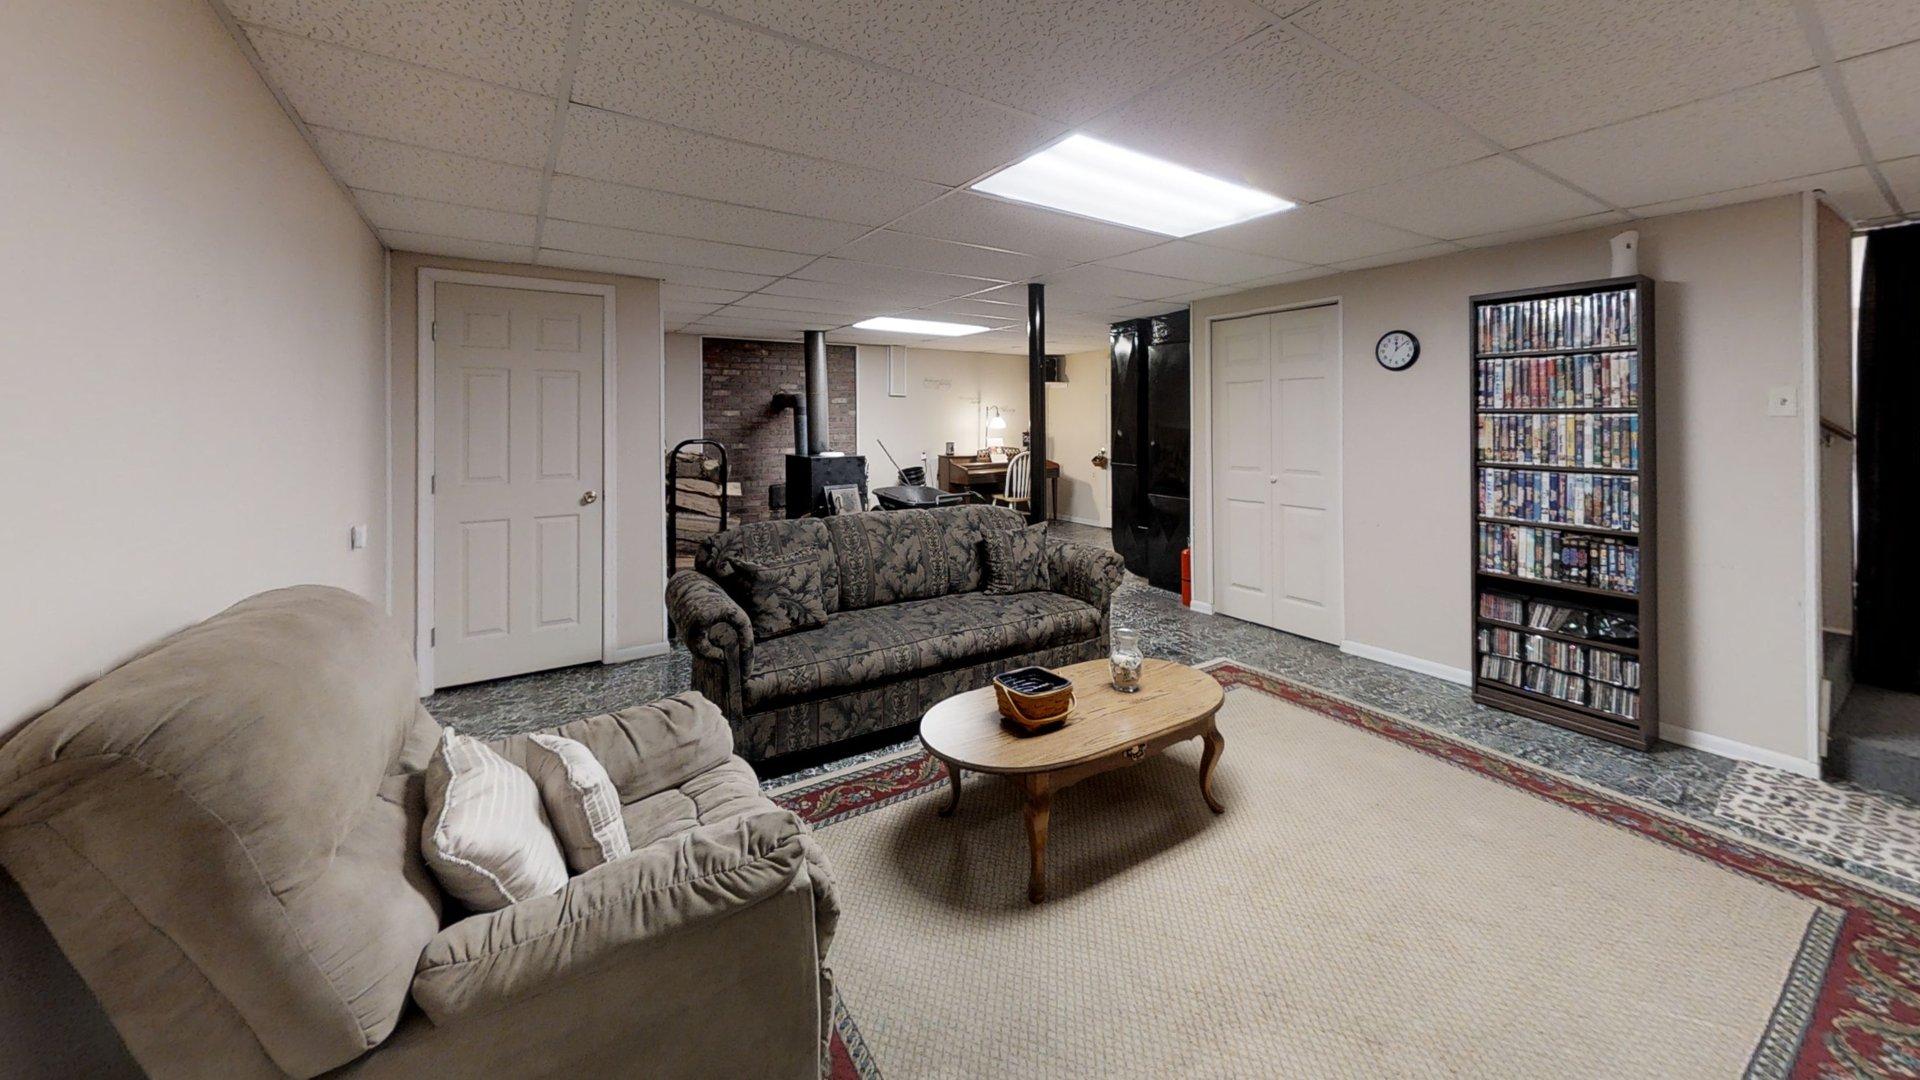 5885 Blue Springs Rd, Hiwassee VA